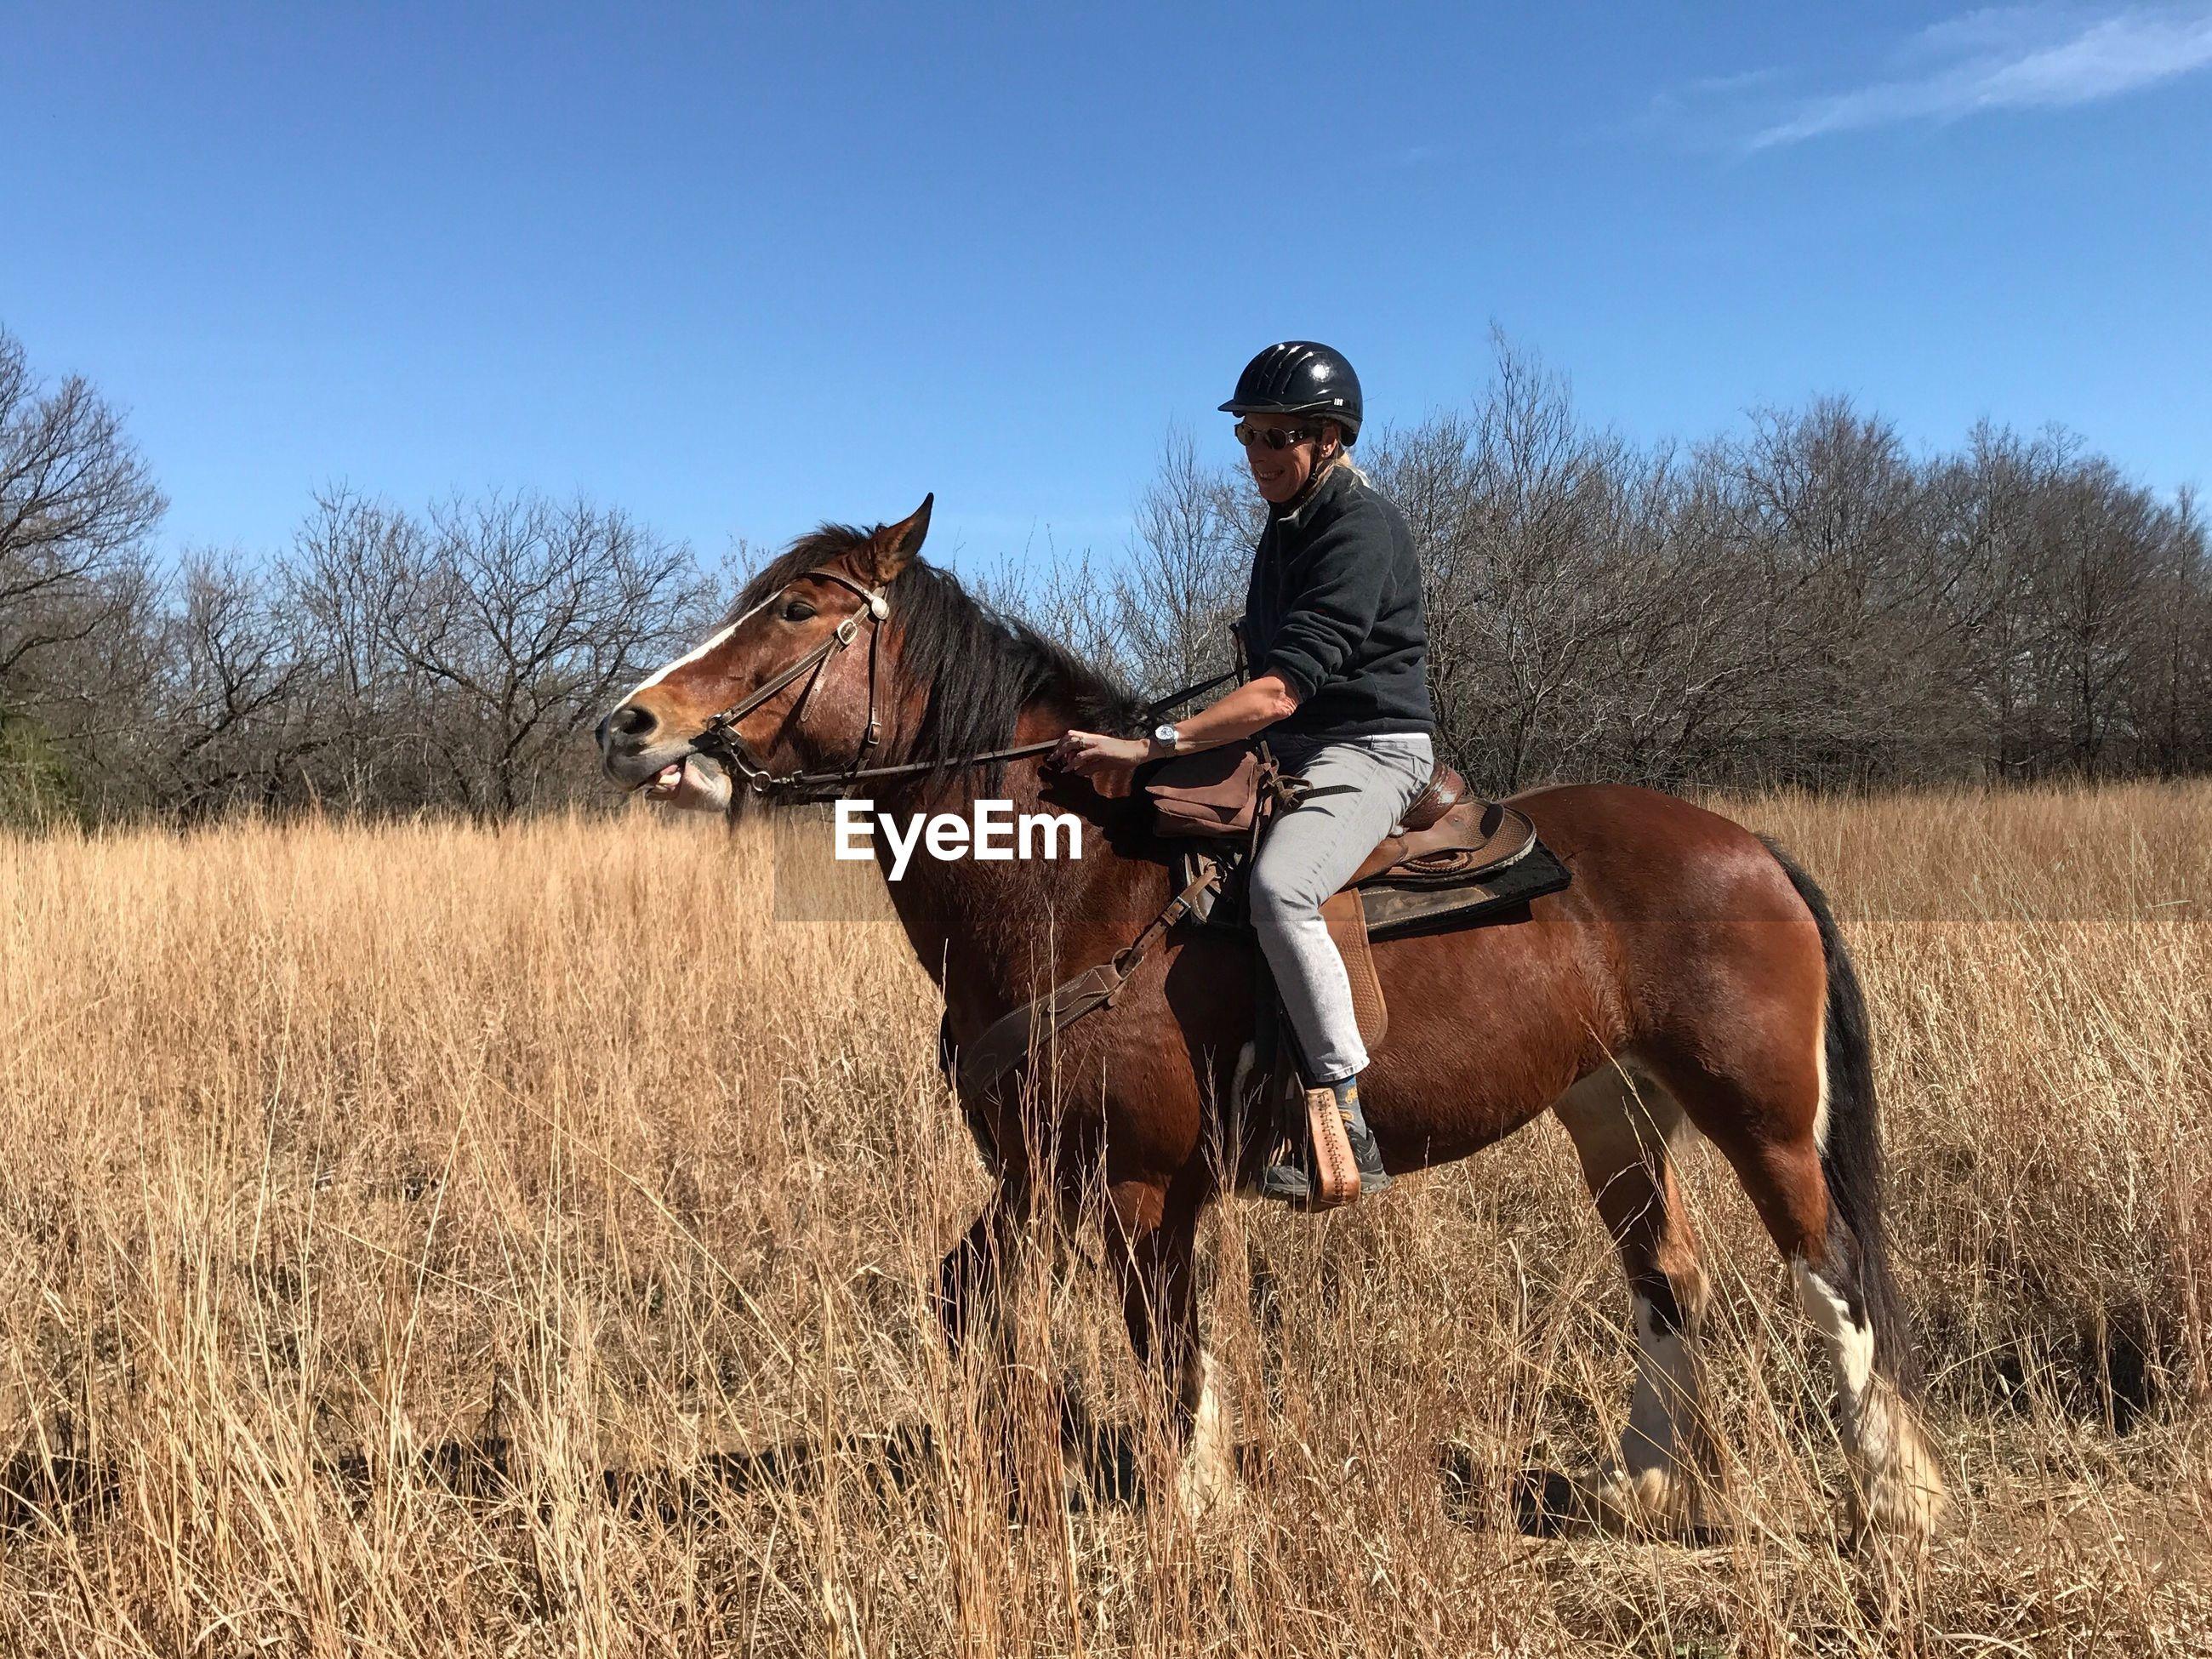 Happy woman wearing helmet riding horse on grassy field against sky